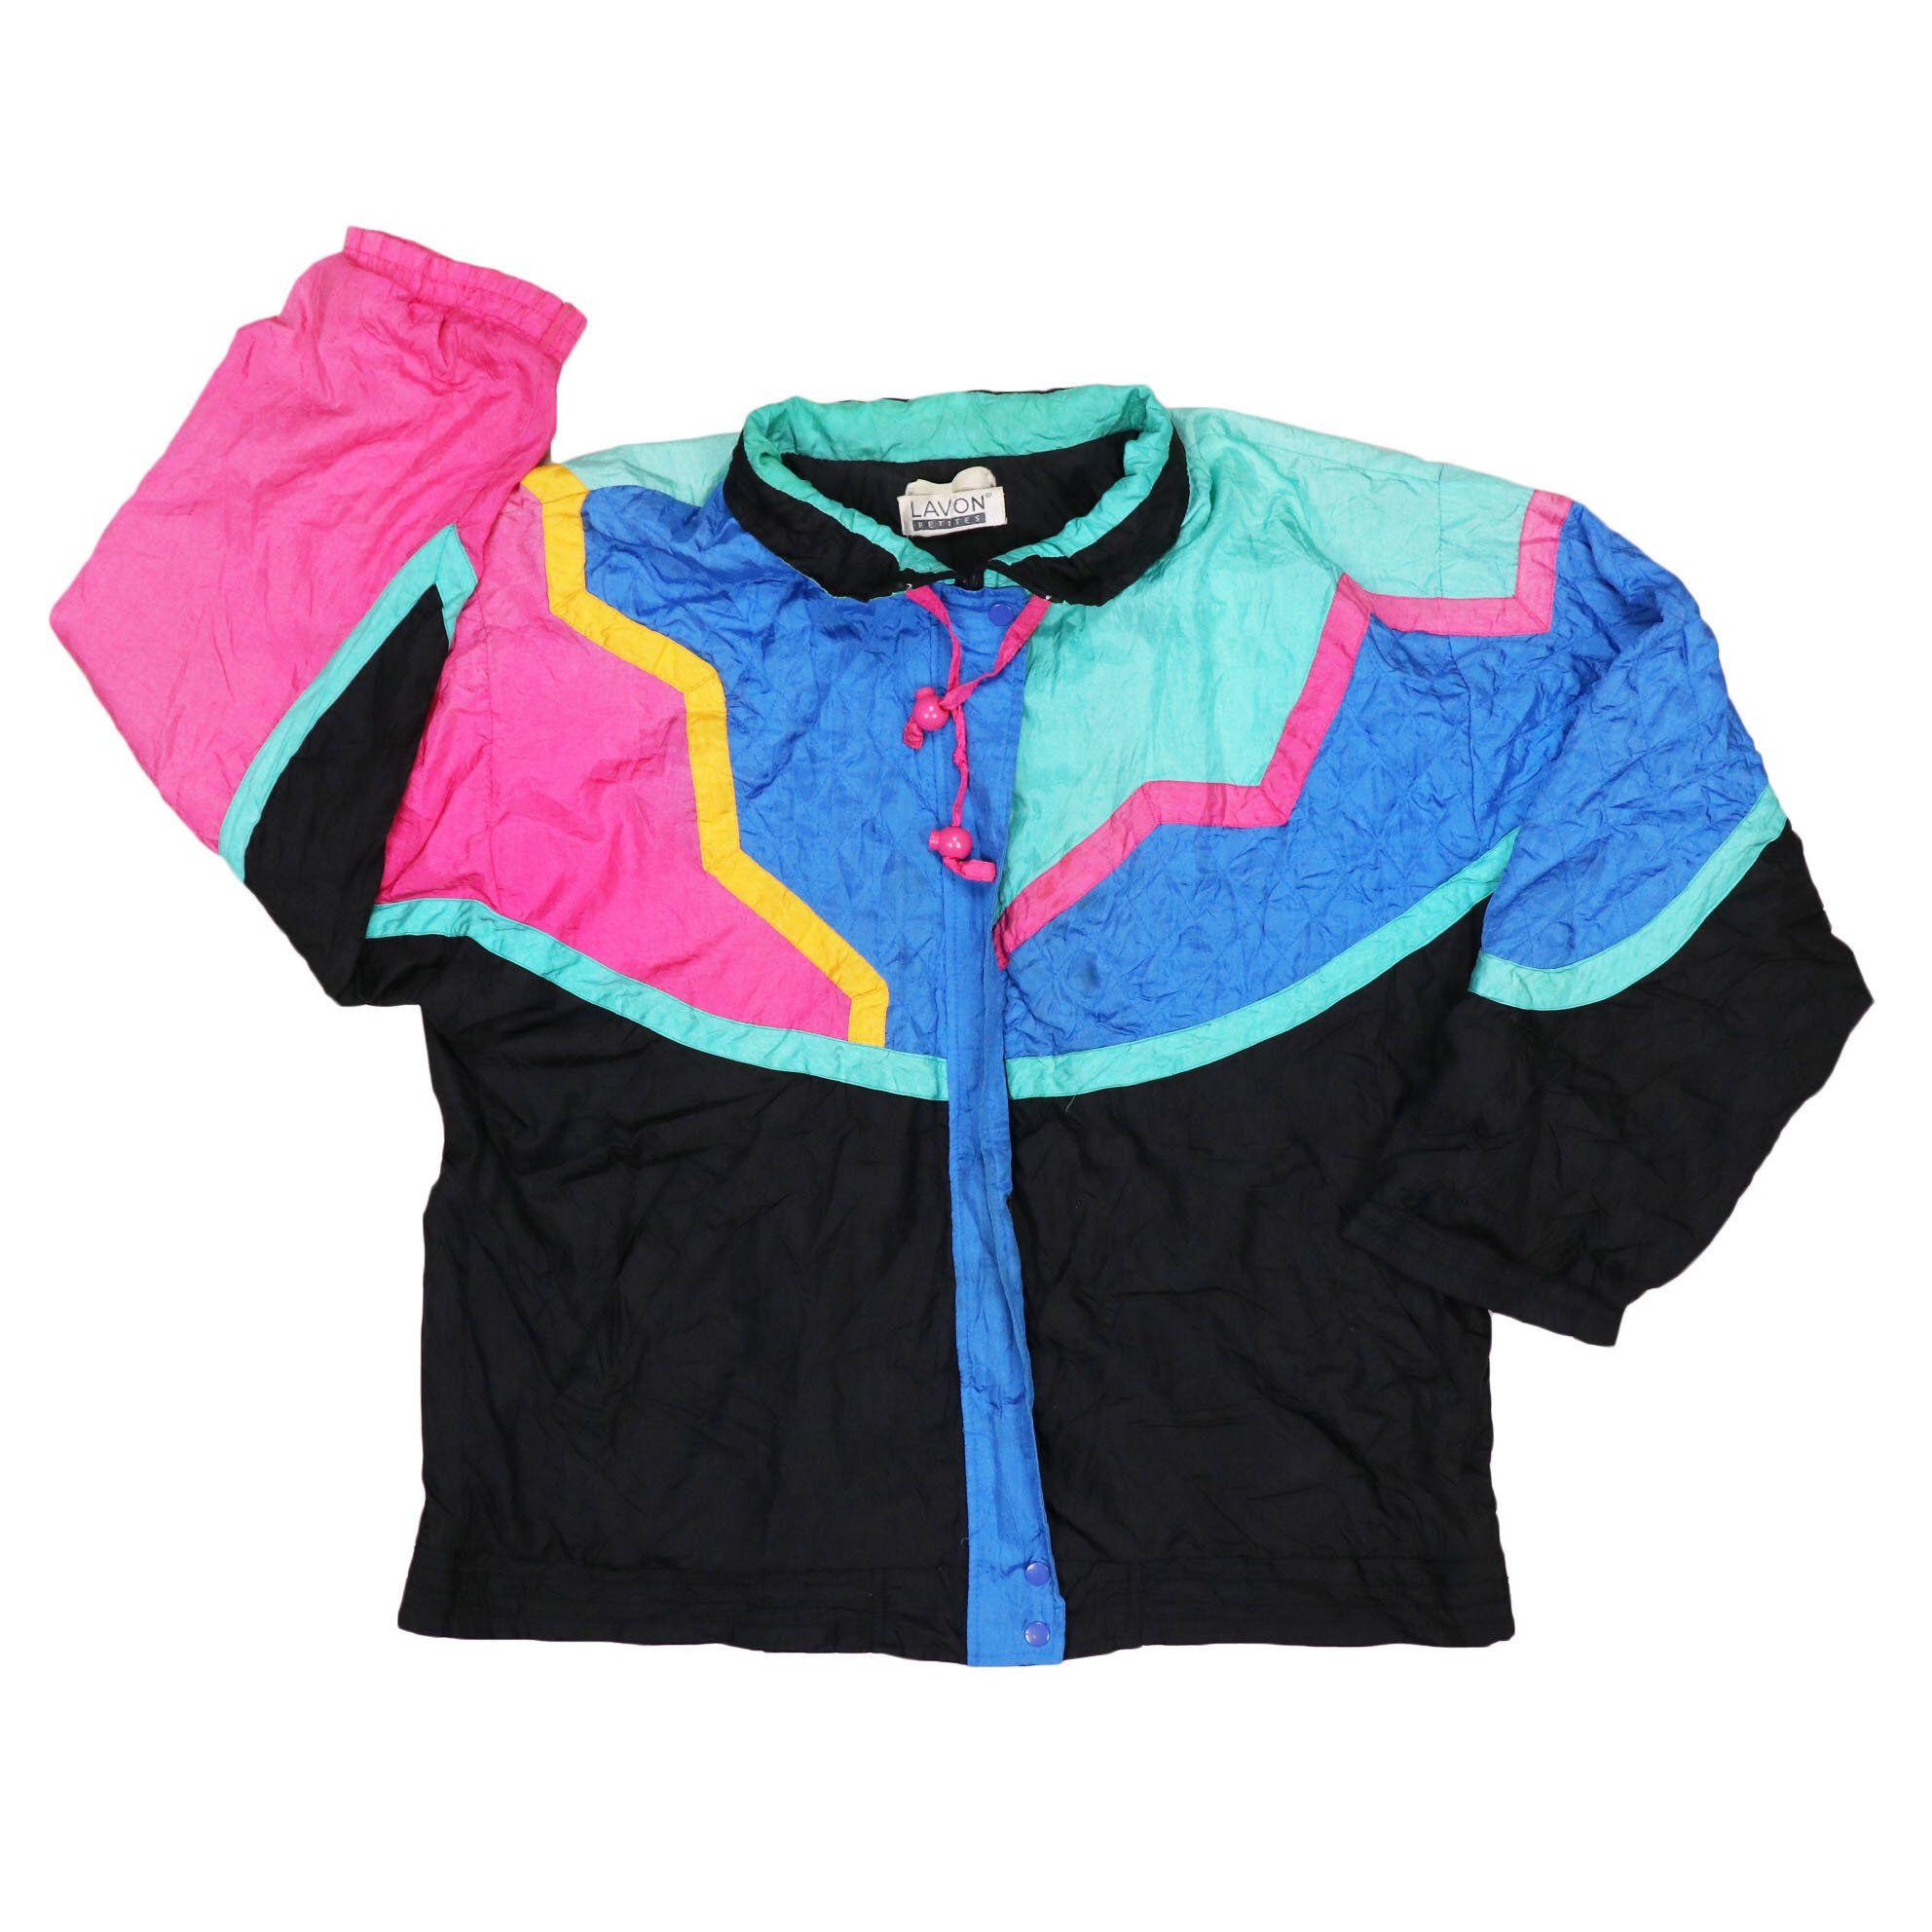 Vintage 80s multicolor bomber shell jacket windbreaker